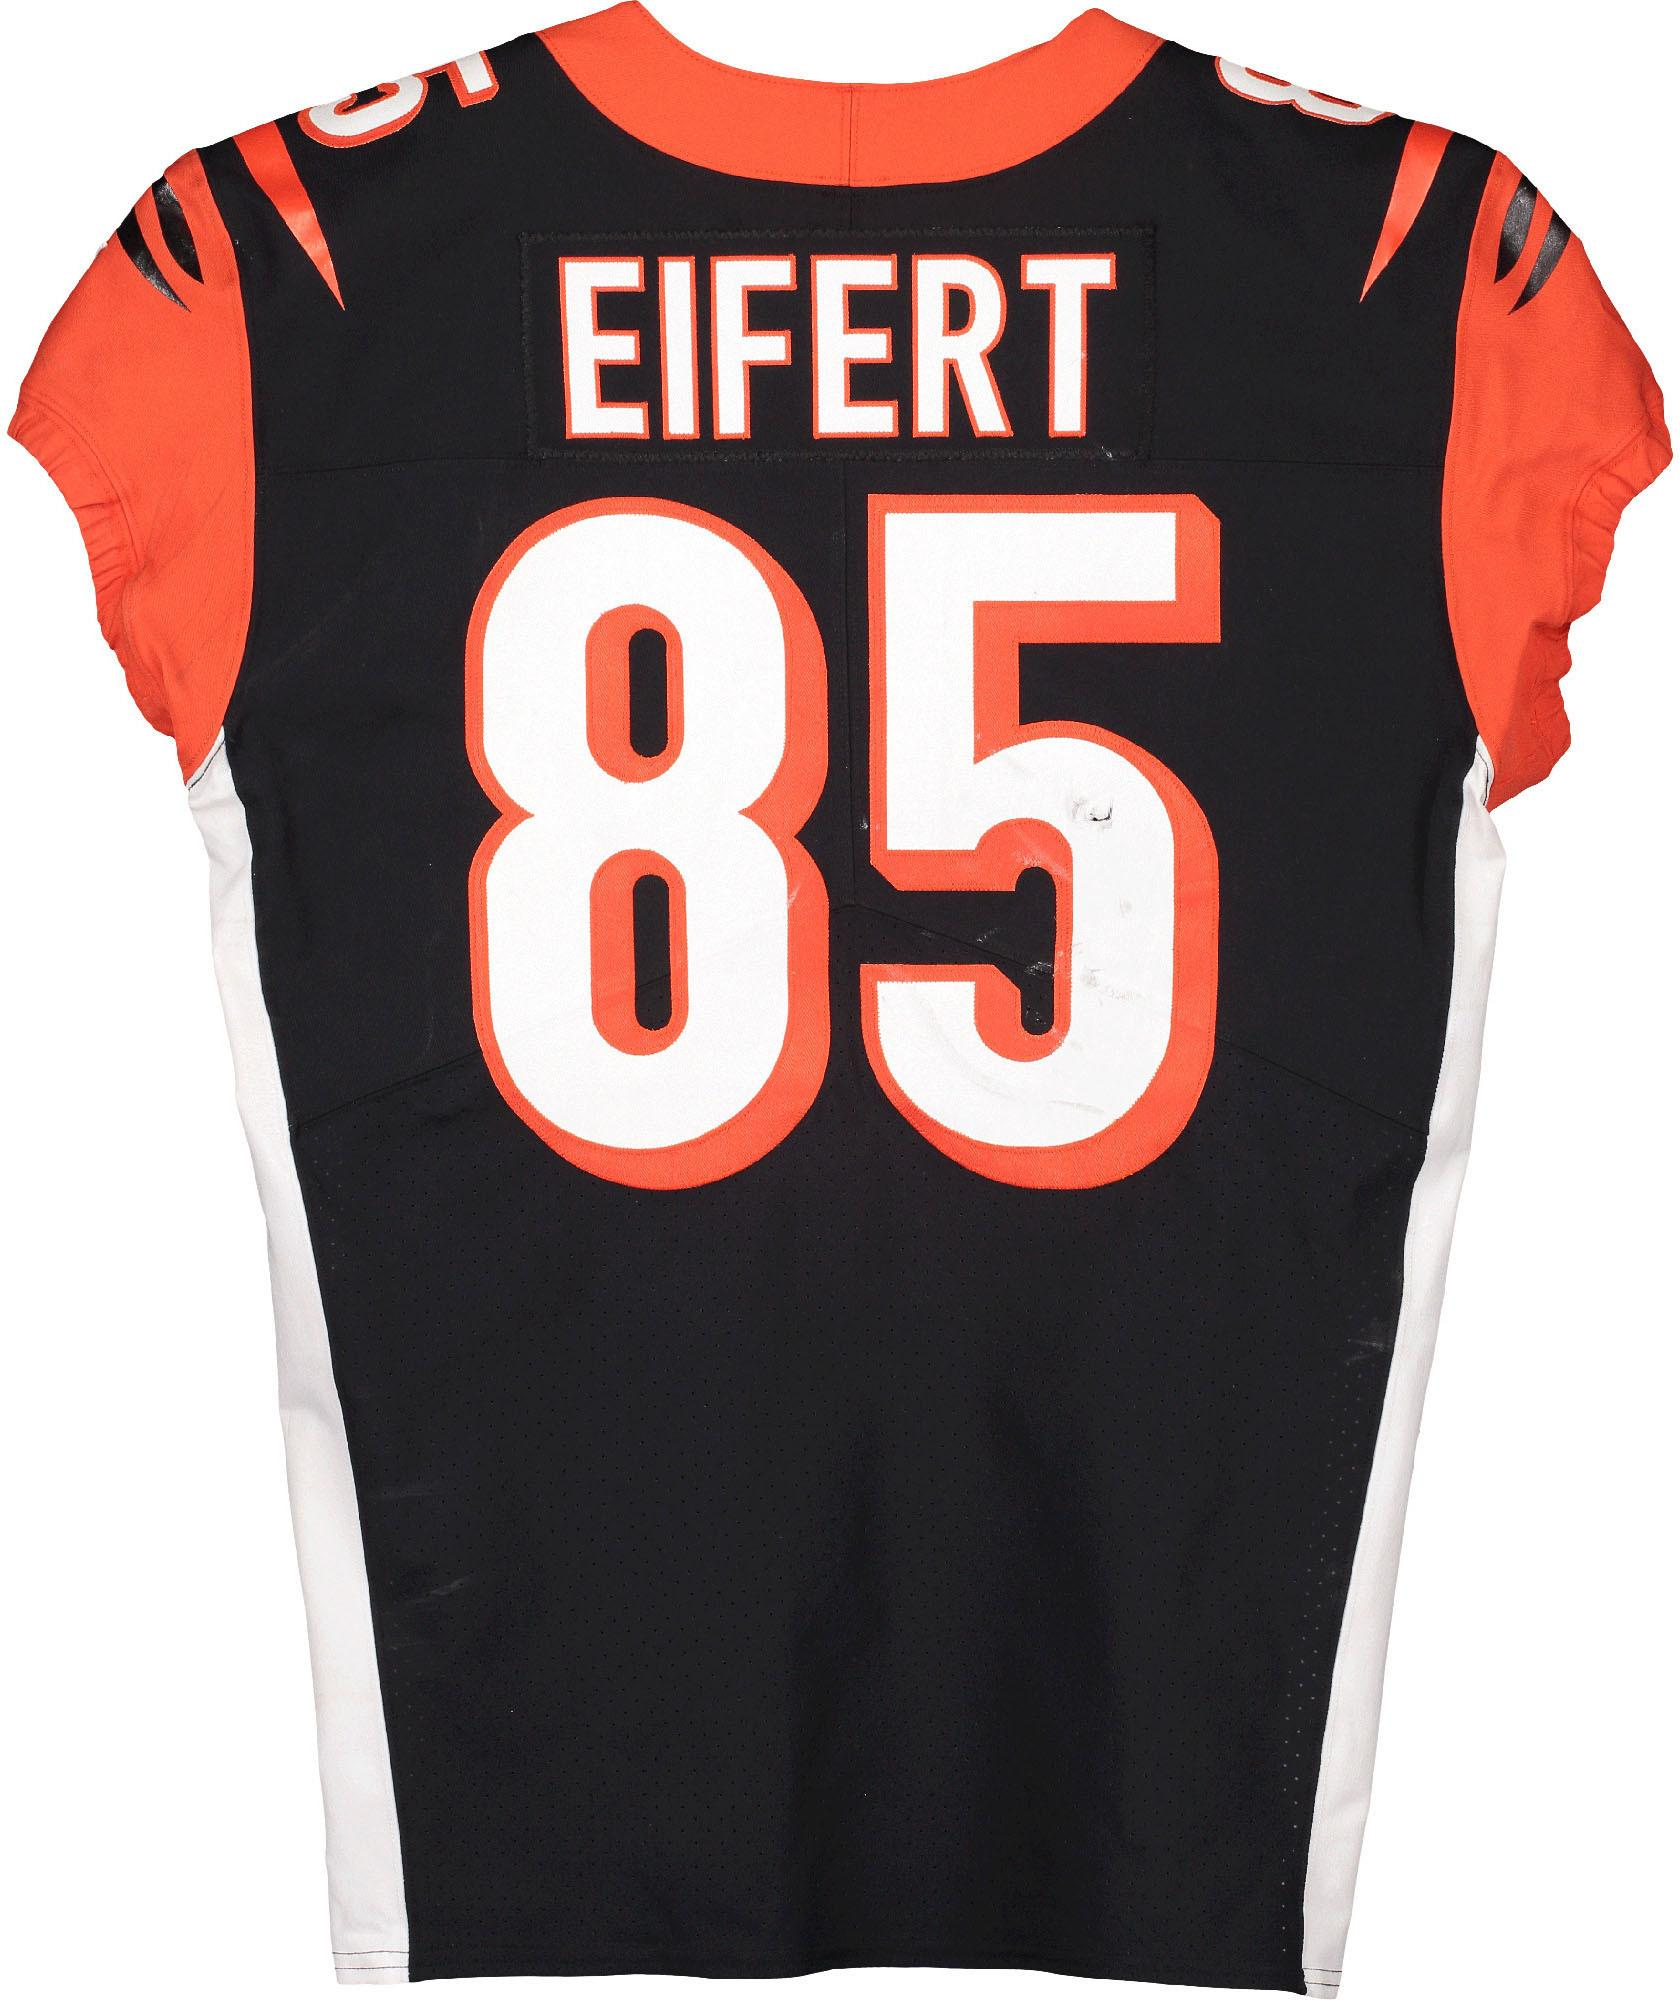 Tyler Eifert Cincinnati Bengals Game-Used #85 Black Jersey vs. Buffalo Bills on September 22, 2019 - Fanatics Authentic Certified - Walmart.com